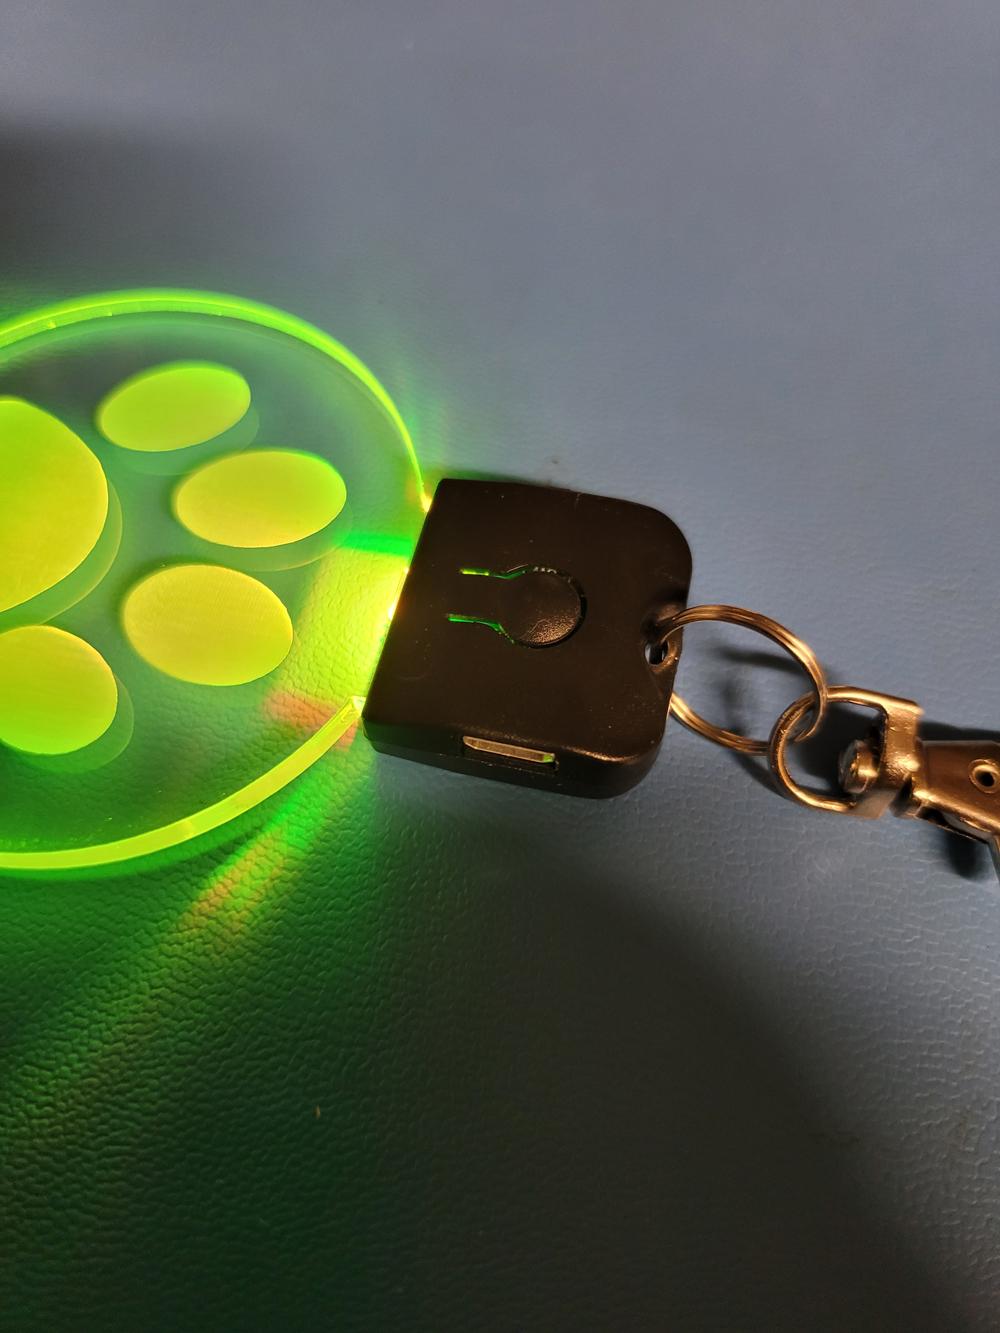 Keychain New - Laser cut light-up keychain